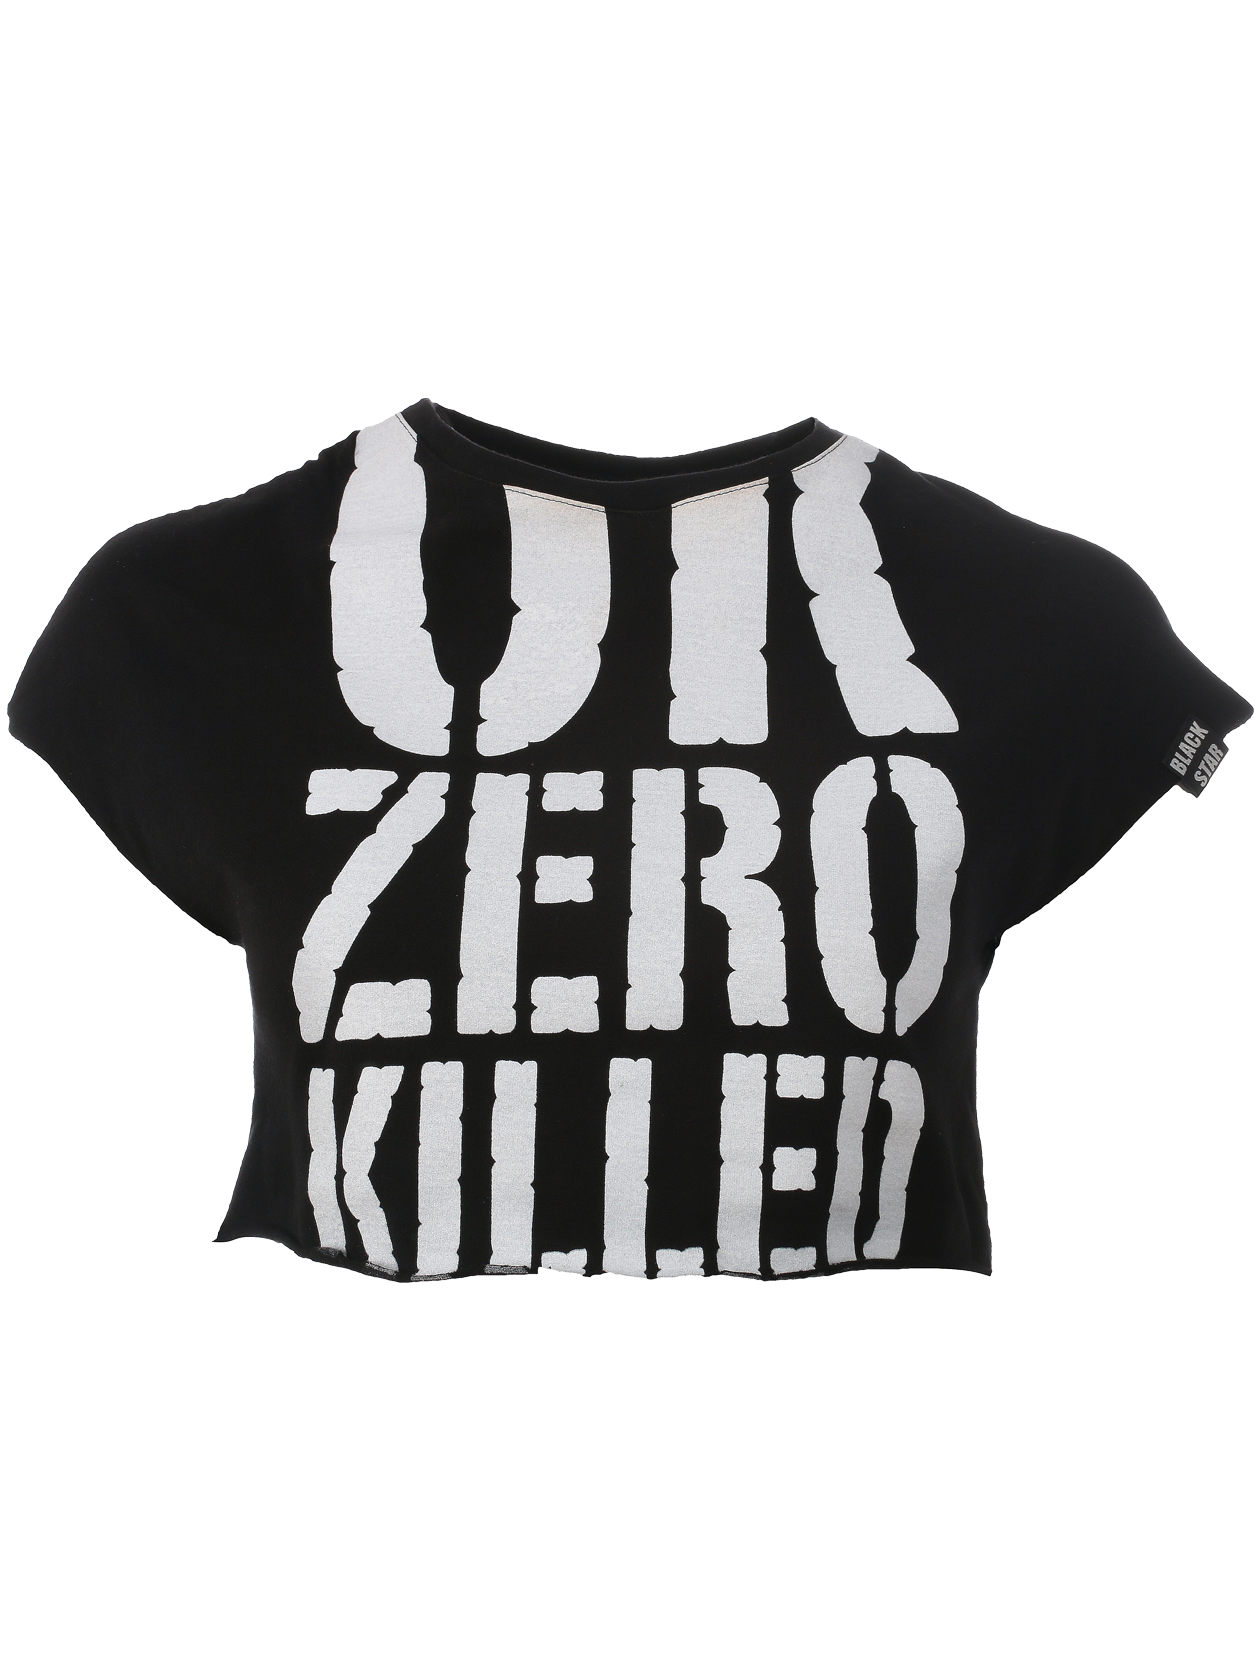 Womens top OK Zero Killed от BlackStarWear INT